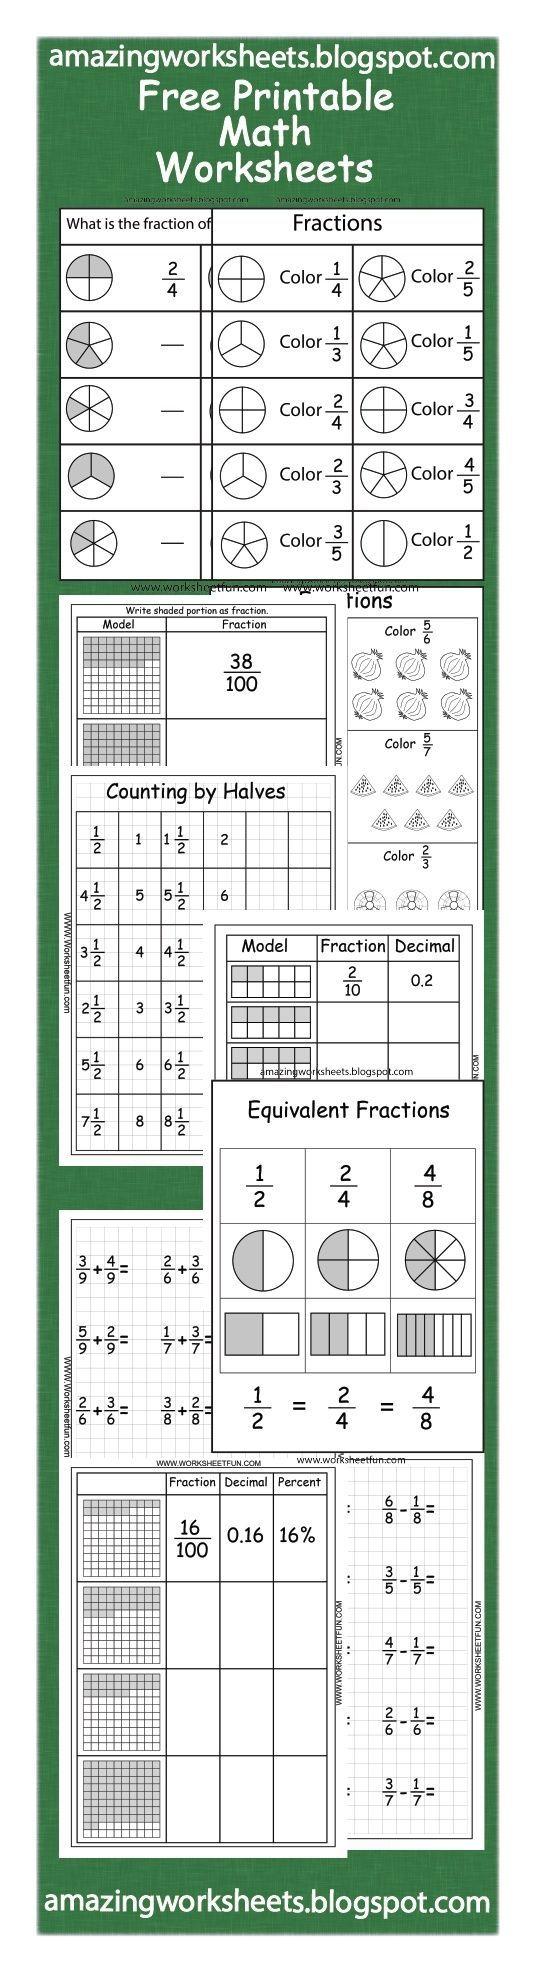 Free Printable Fractions Worksheets by Zulfiqar Ali